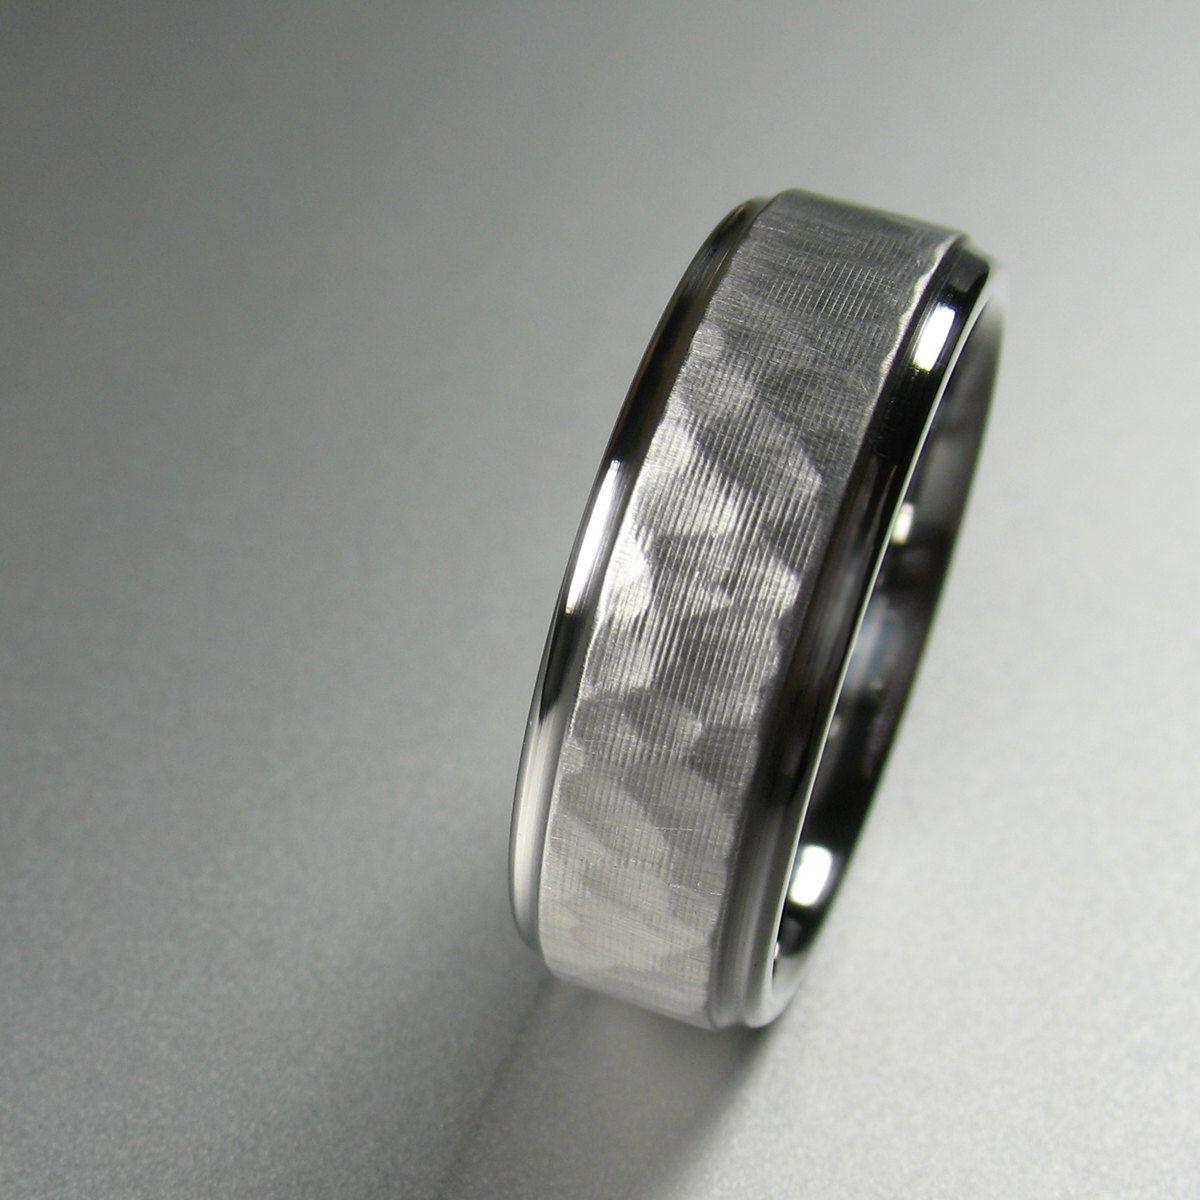 tungsten hammered wedding band Men s Wedding Band Stainless Steel Comfort Fit